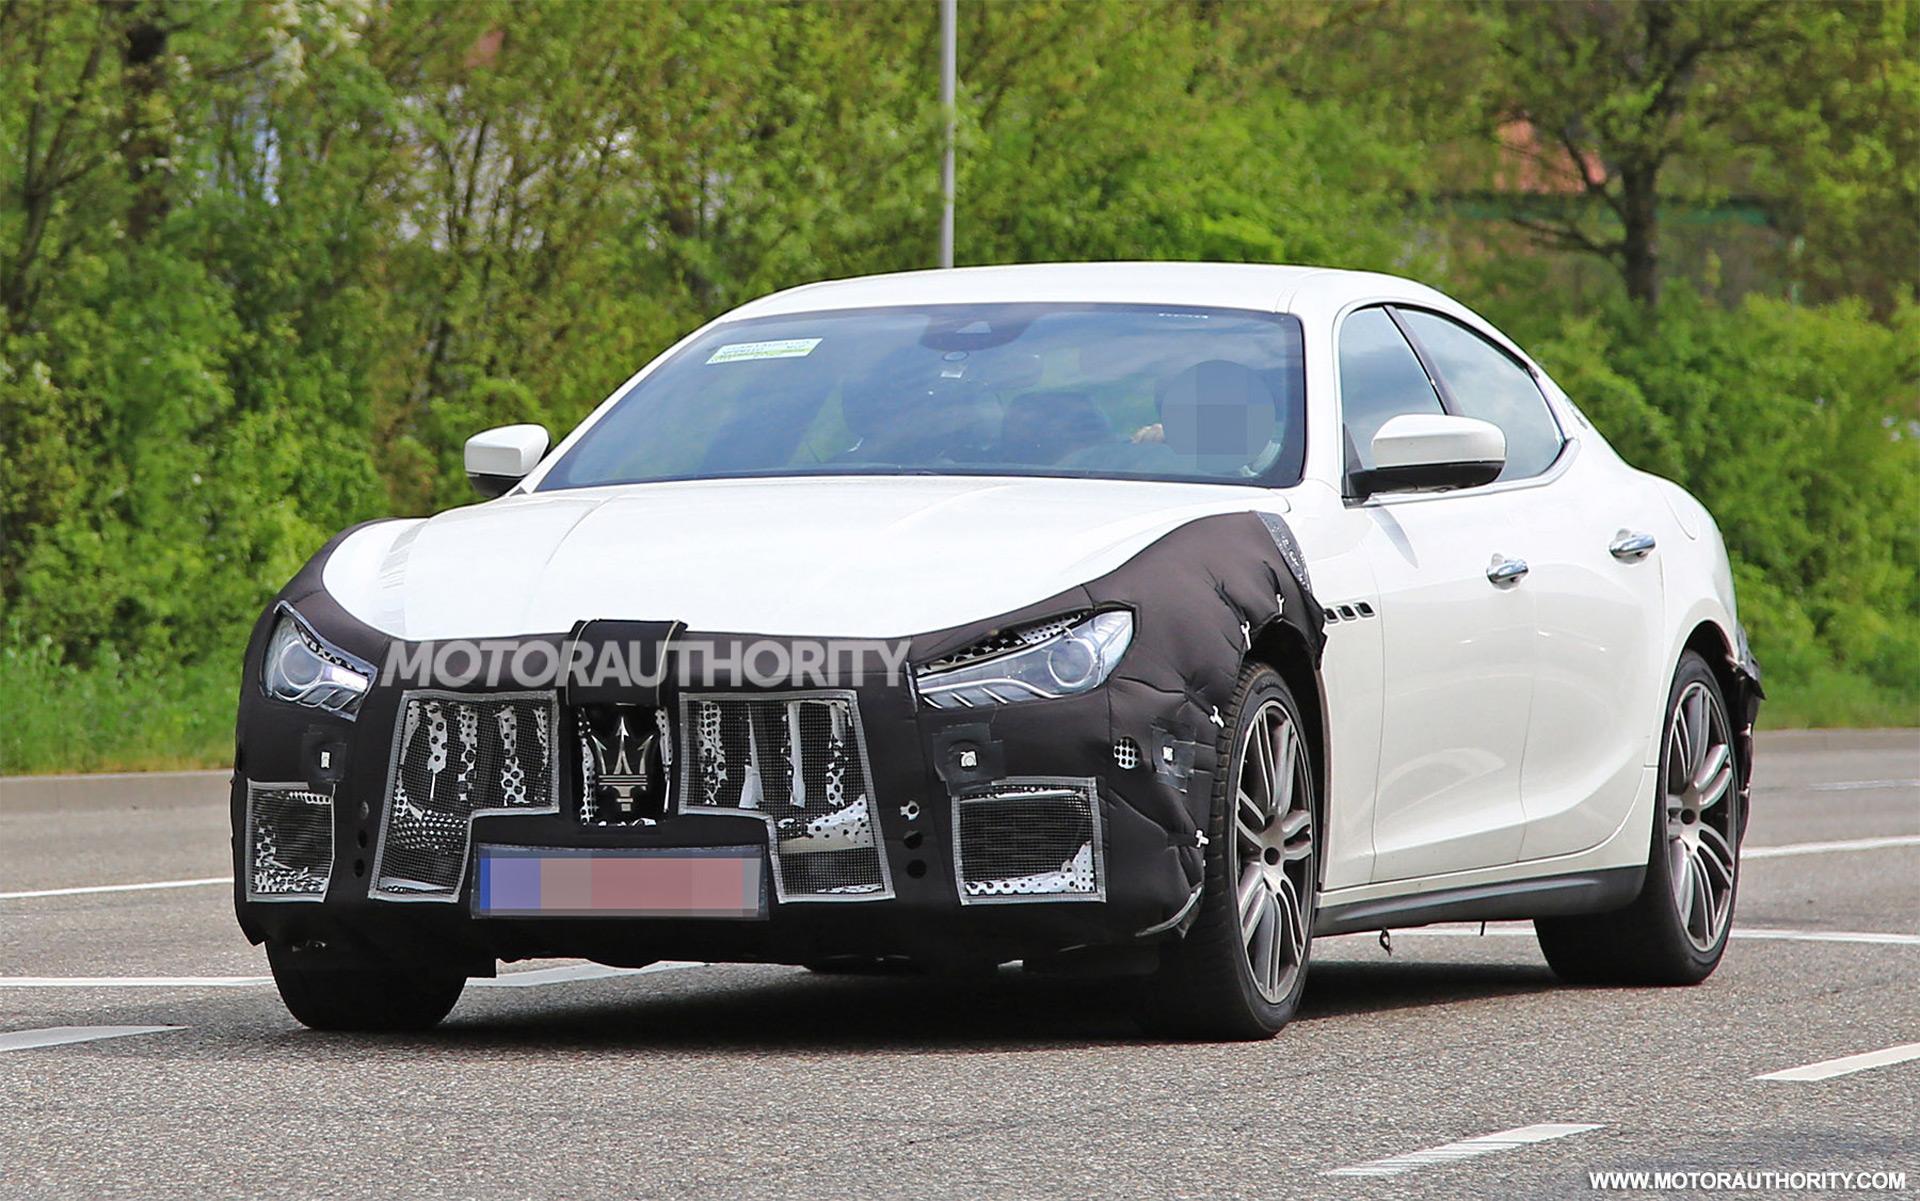 2018 maserati quattroporte interior.  interior on 2018 maserati quattroporte interior